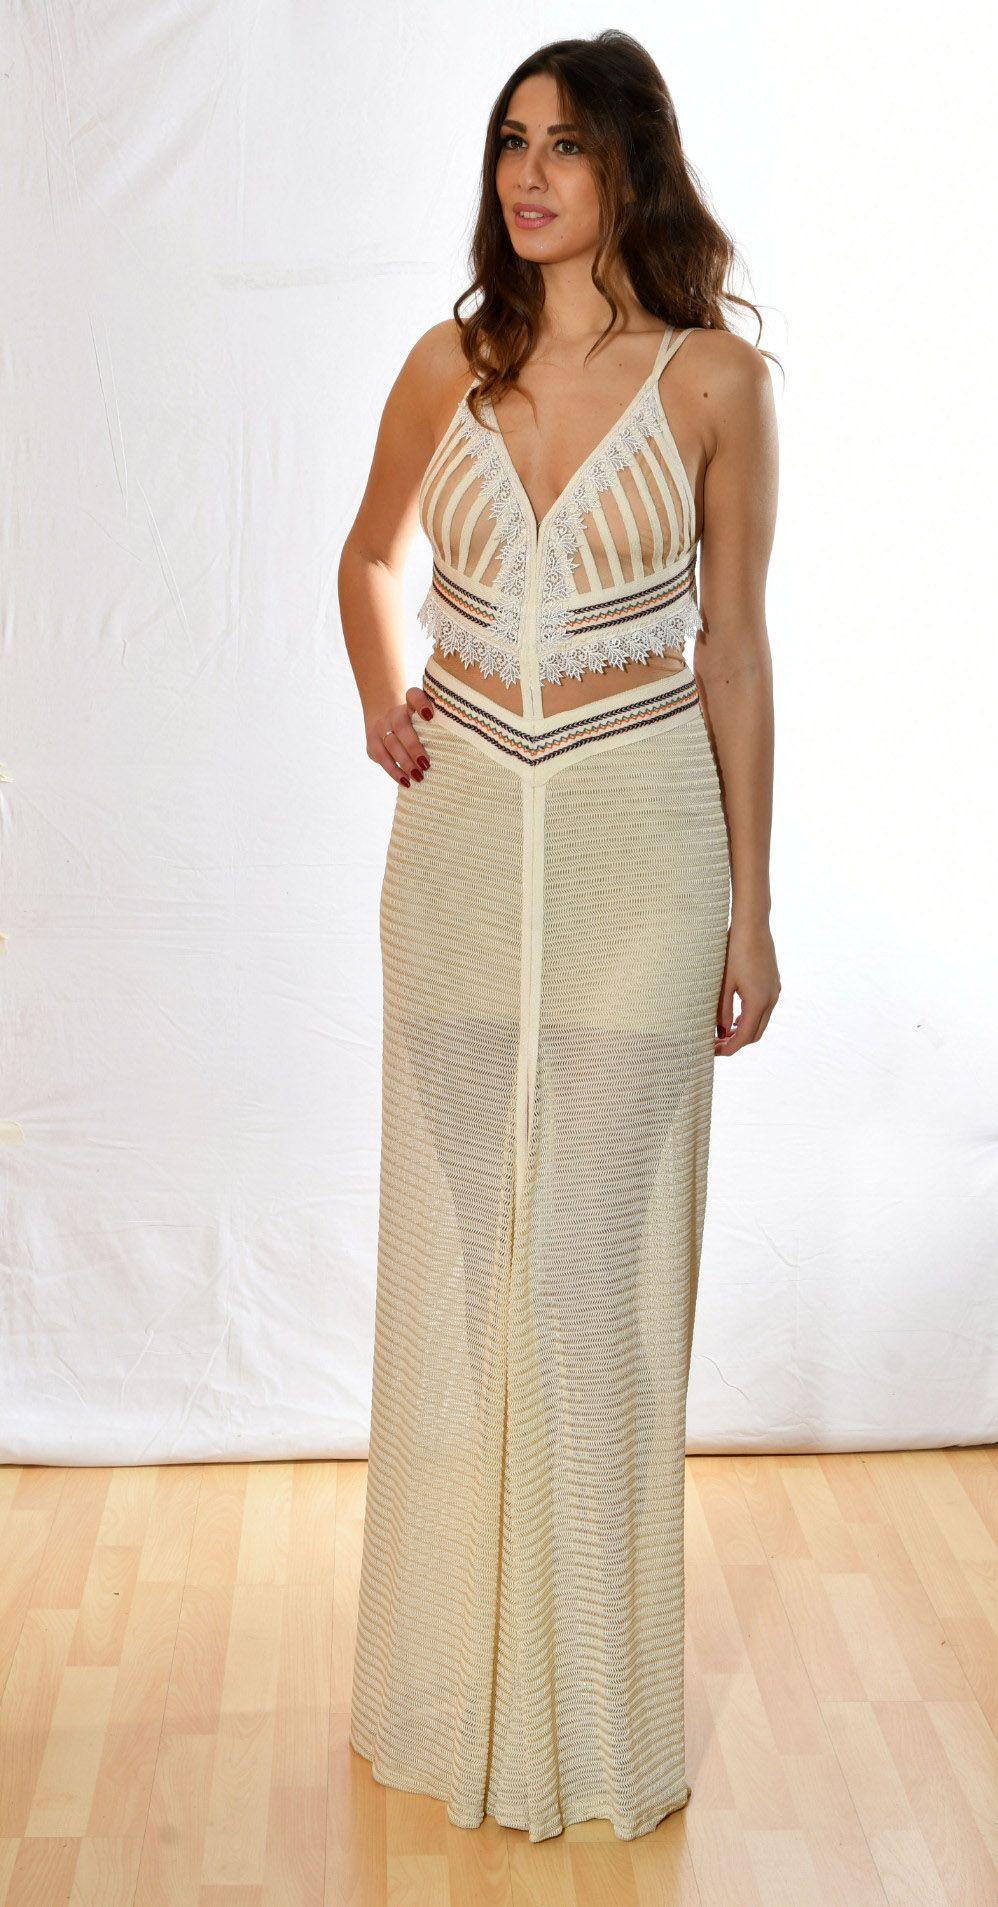 98f7e8c3127a Μακρύ βραδυνό φόρεμα σε μπέζ αποχρώσεις με διαφάνεια στο κάτω μέρος της  φούστας και διαφάνειες τούλι